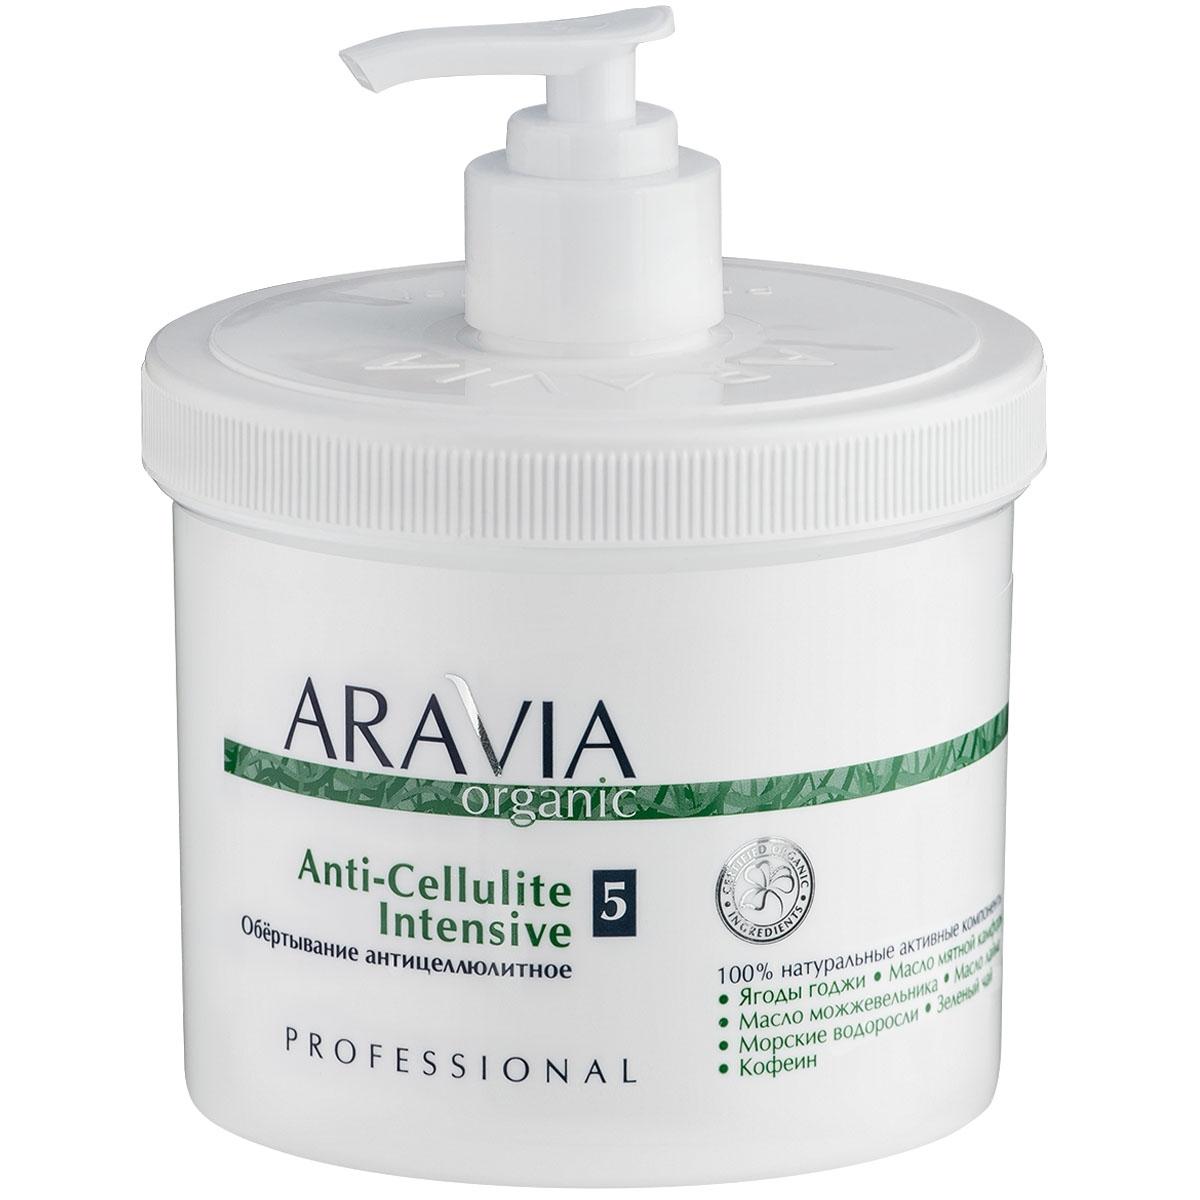 ARAVIA ARAVIA Organic Обёртывание Антицеллюлитное «Anti-Cellulite Intensive», 550 мл aravia обертывание антицеллюлитное отзывы